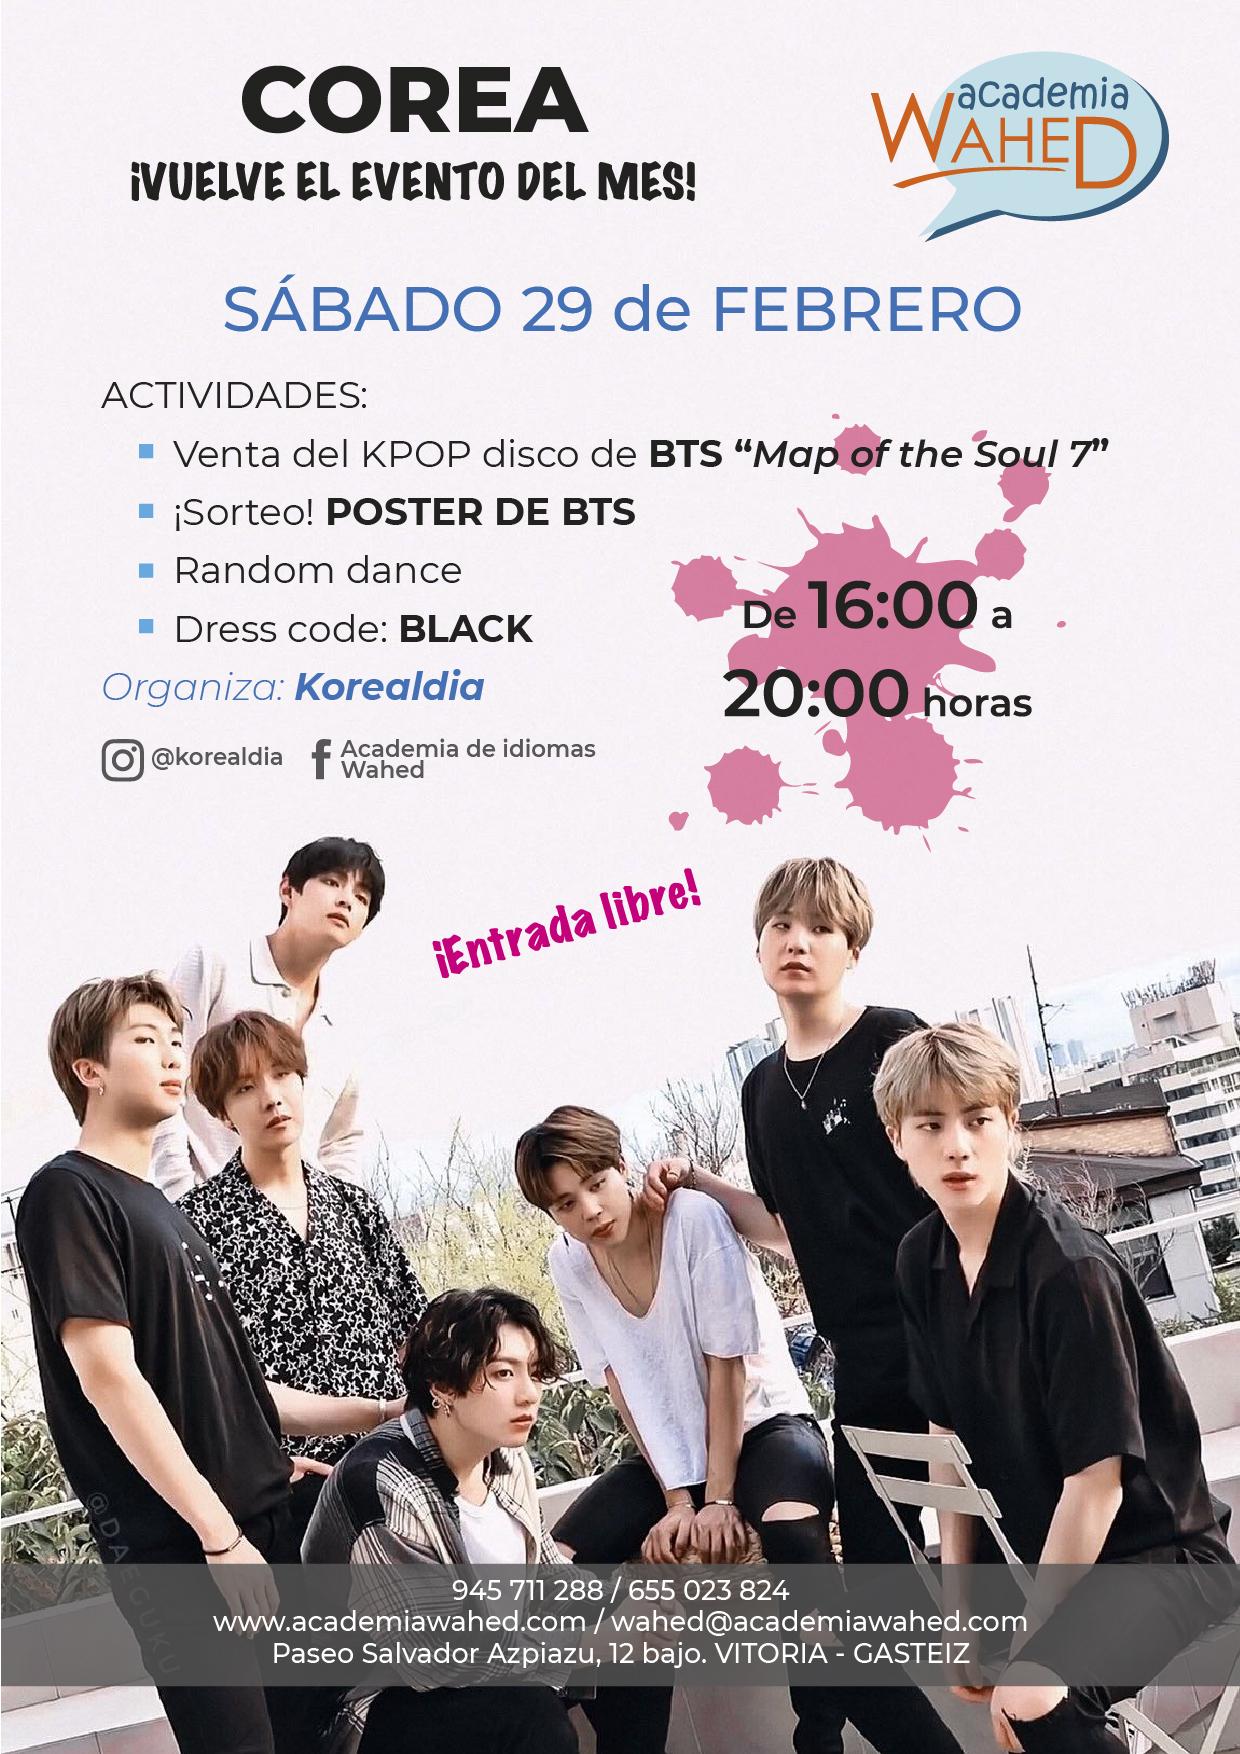 Wahed-evento coreano febrero 20